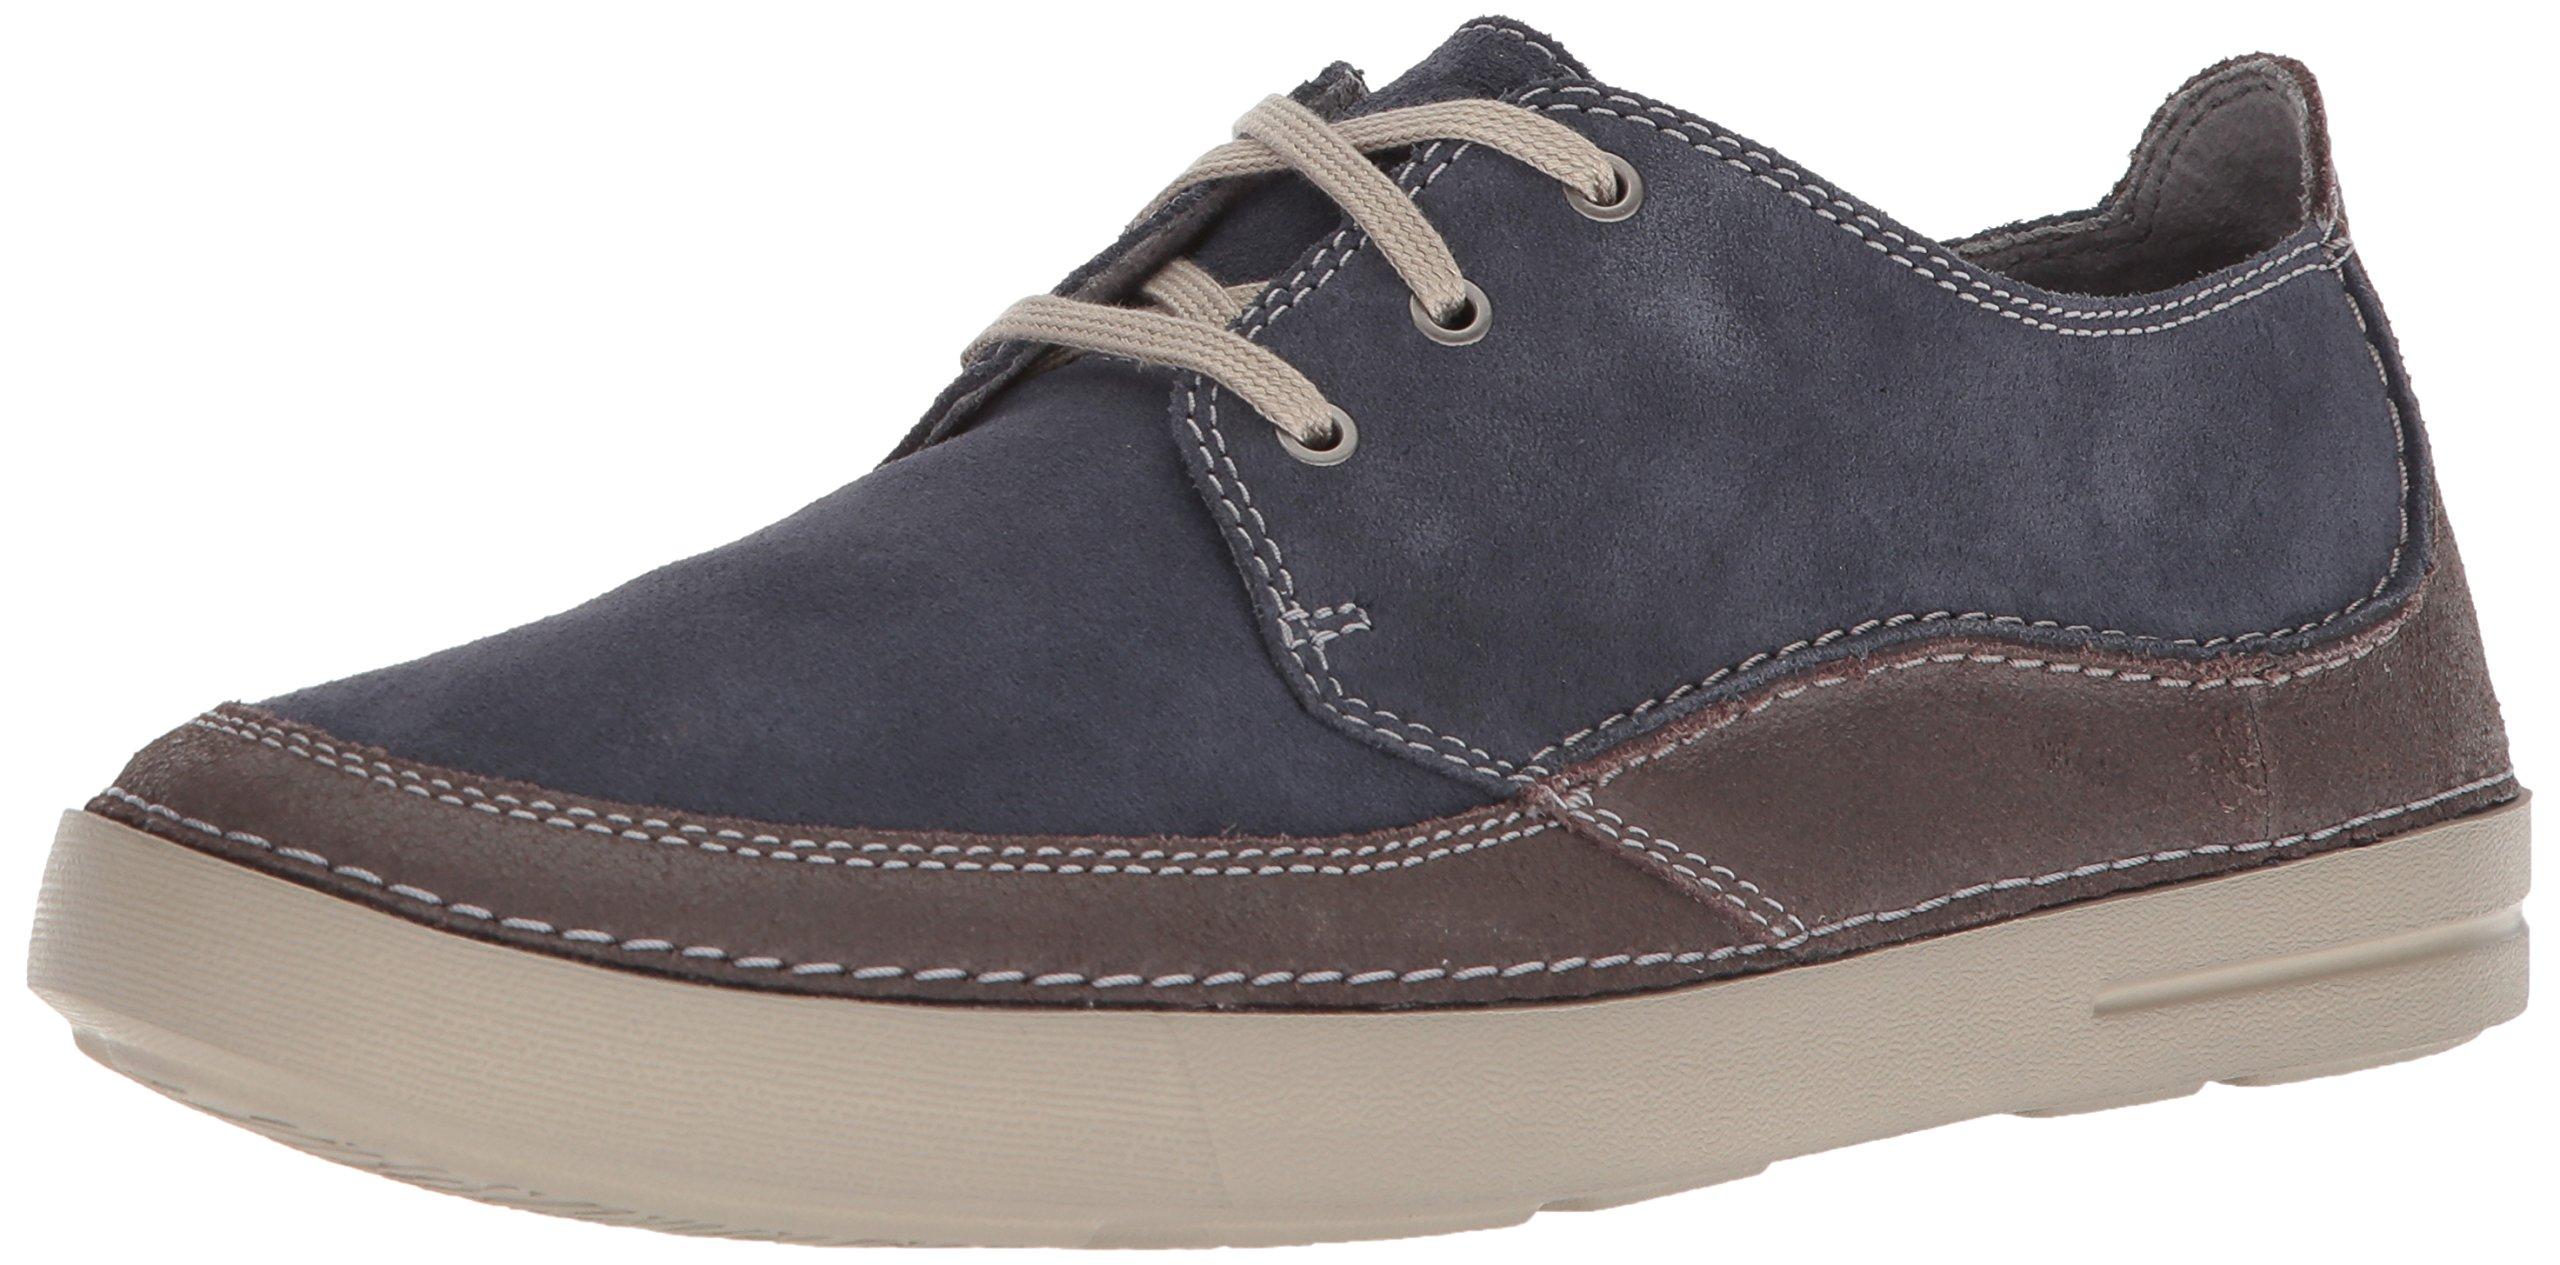 CLARKS Men's Gosler Edge Sneaker, Blue Suede, 9.5 M US